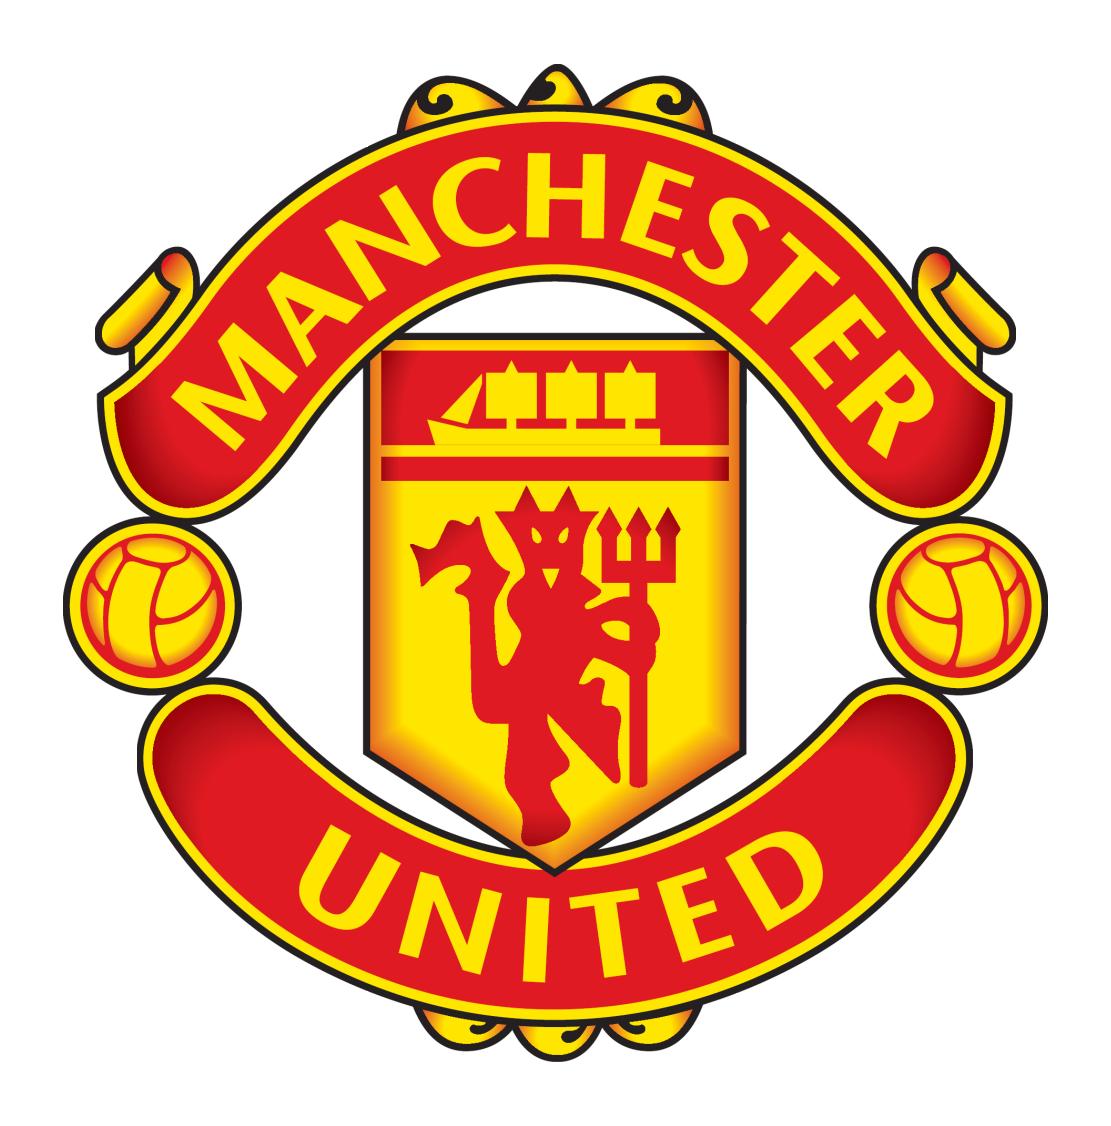 45 Manchester United Wallpaper 3d 2015 On Wallpapersafari